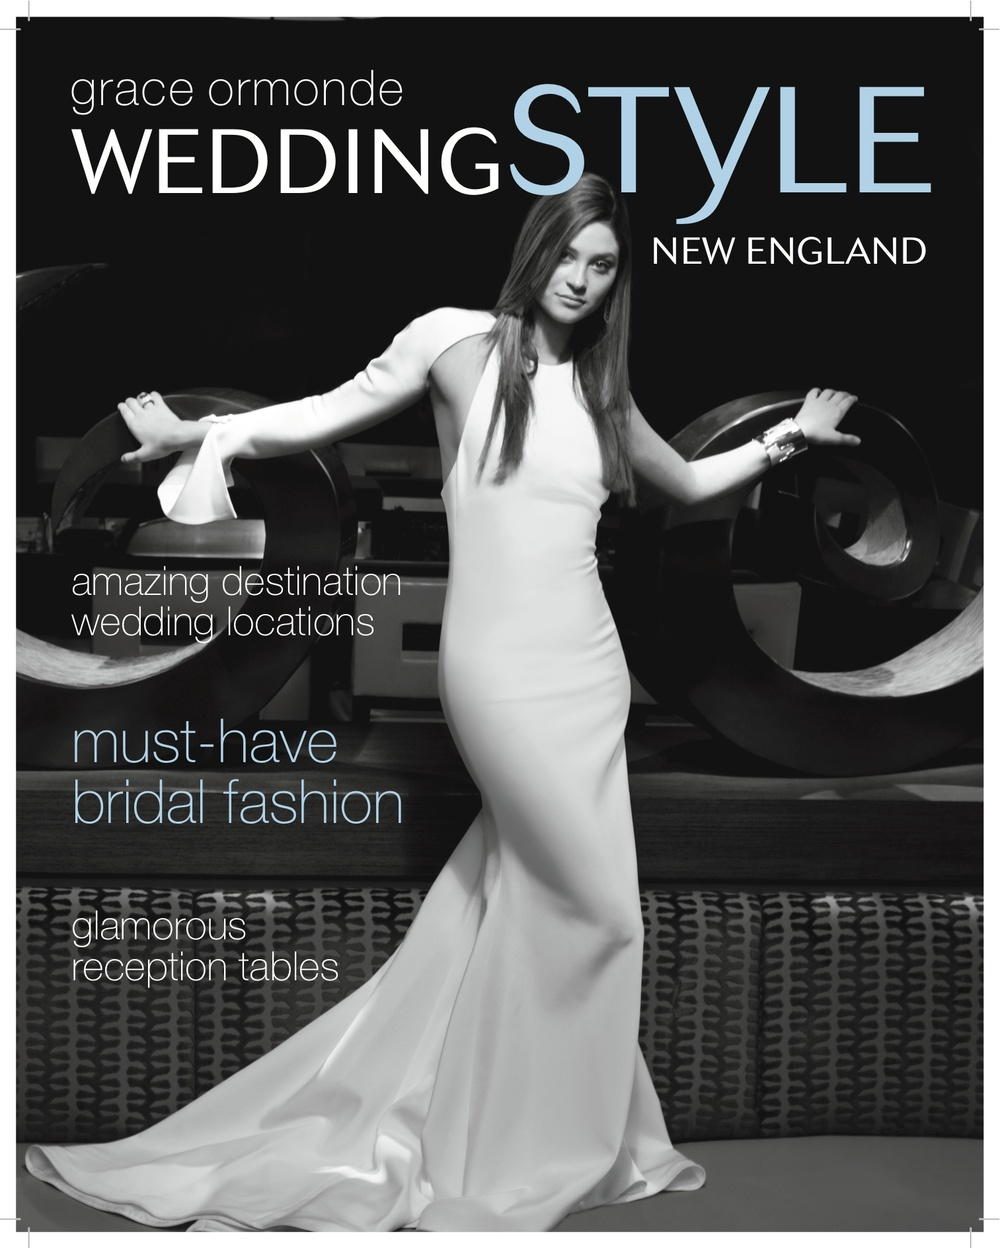 Grace Ormonde Wedding Style, 2010